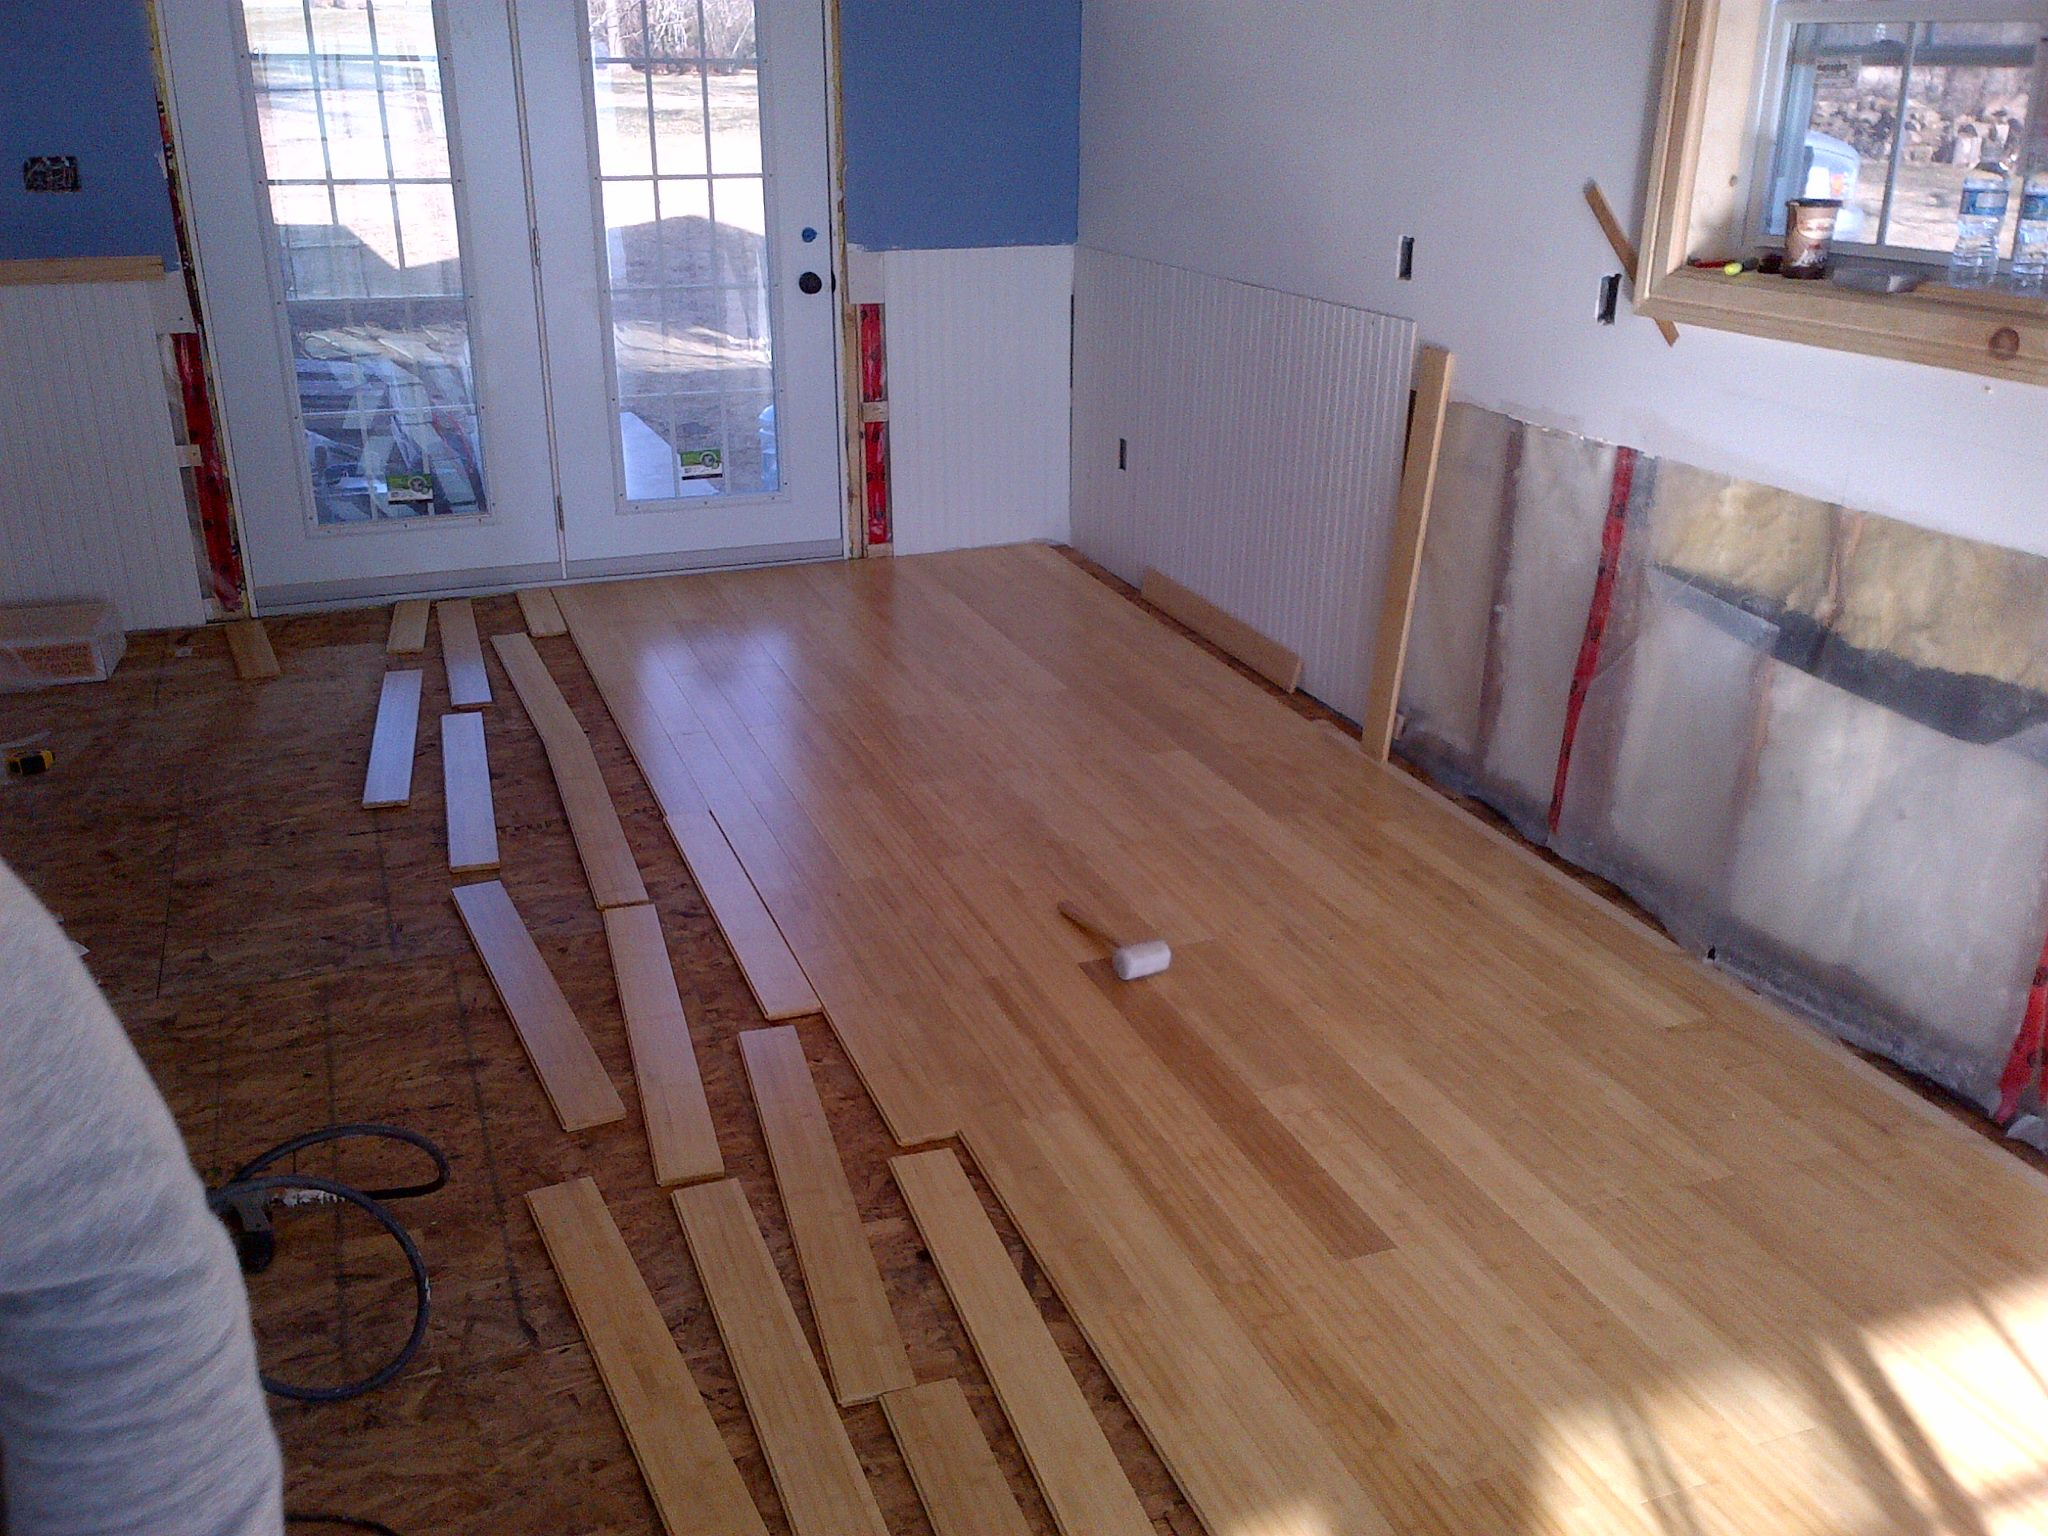 best flooring ideas image of: laminate flooring in basement cold floor NBOQAPI